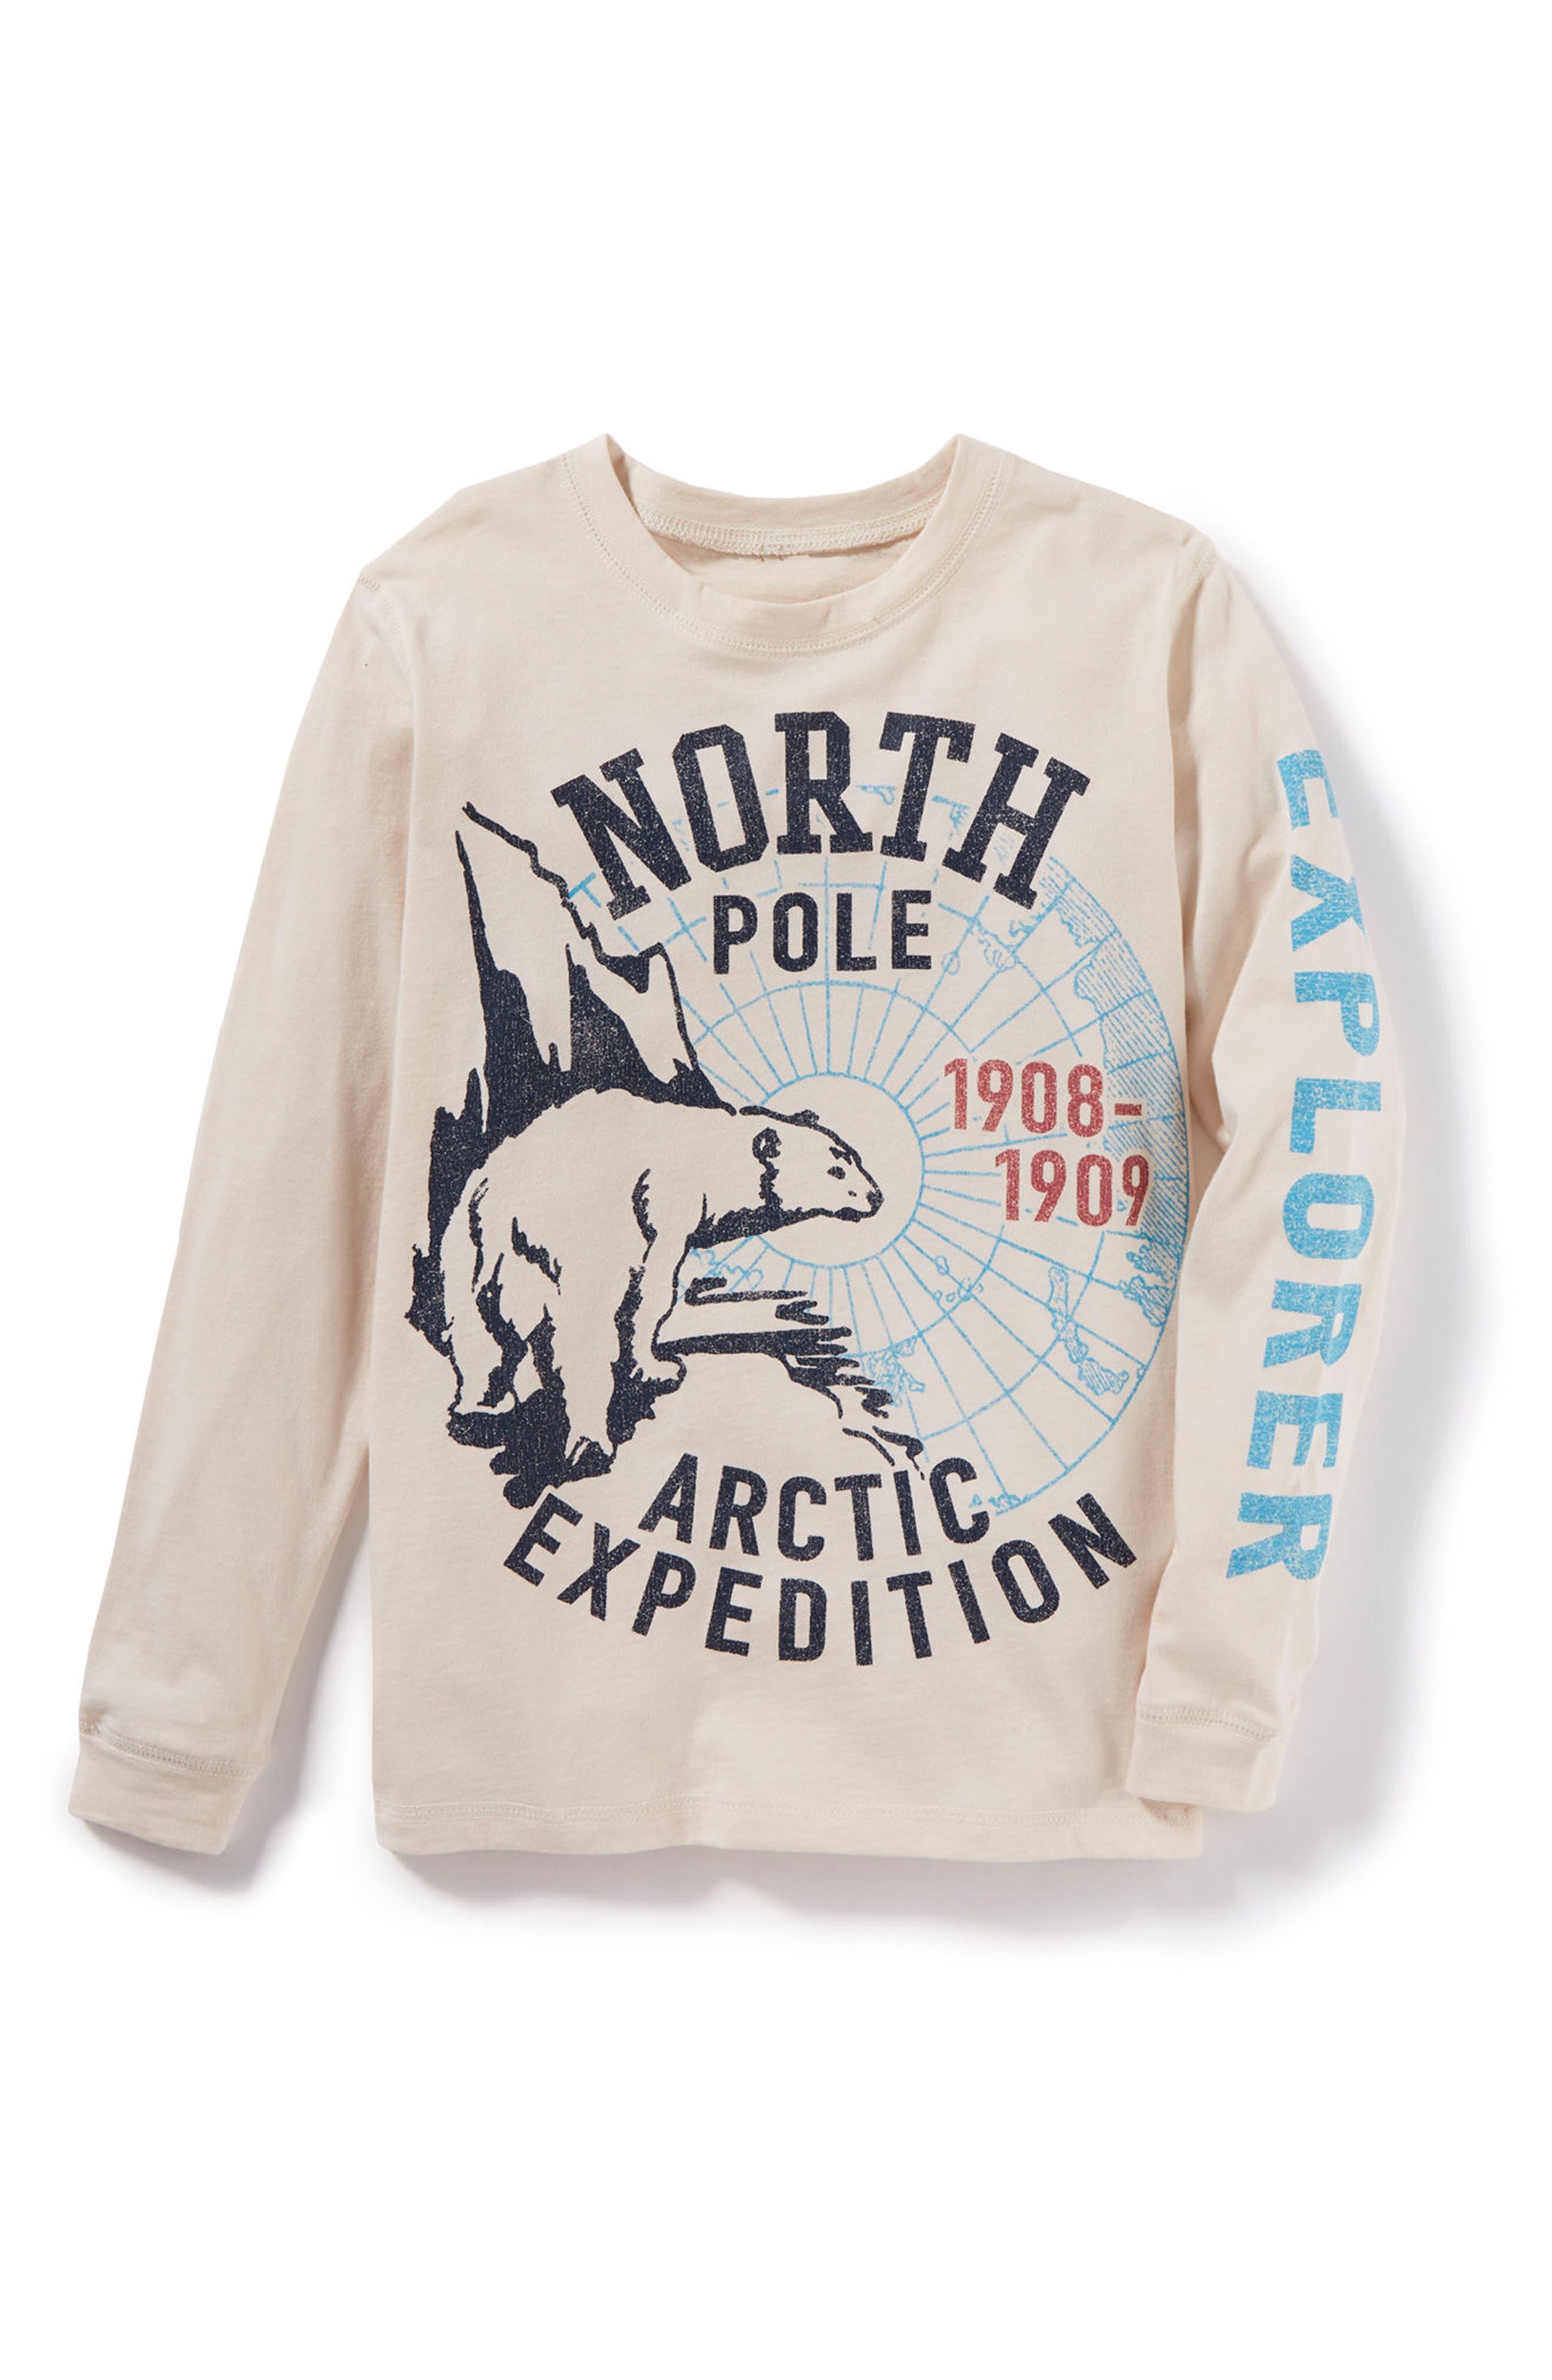 Main Image - Peek Arctic Expedition Graphic Long Sleeve T-Shirt (Toddler Boys, Little Boys & Big Boys)